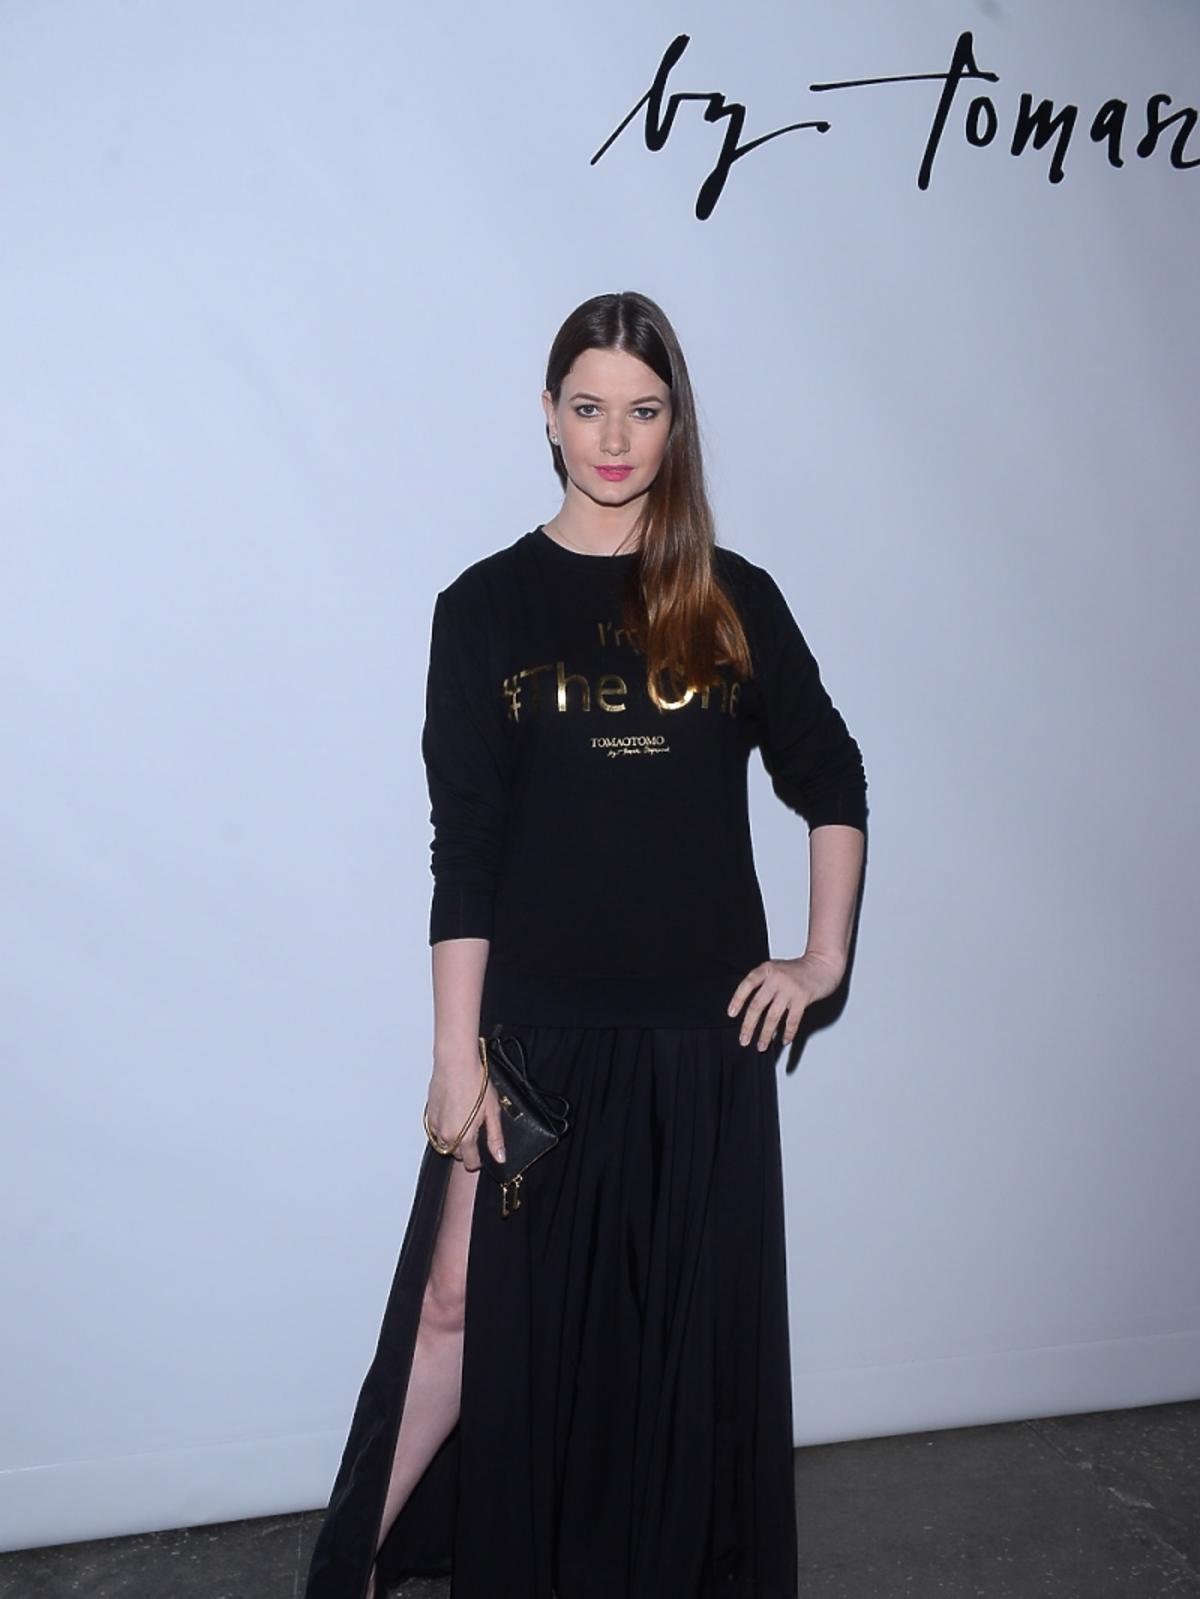 Karolina Maliowska na pokazie Tomaotomo